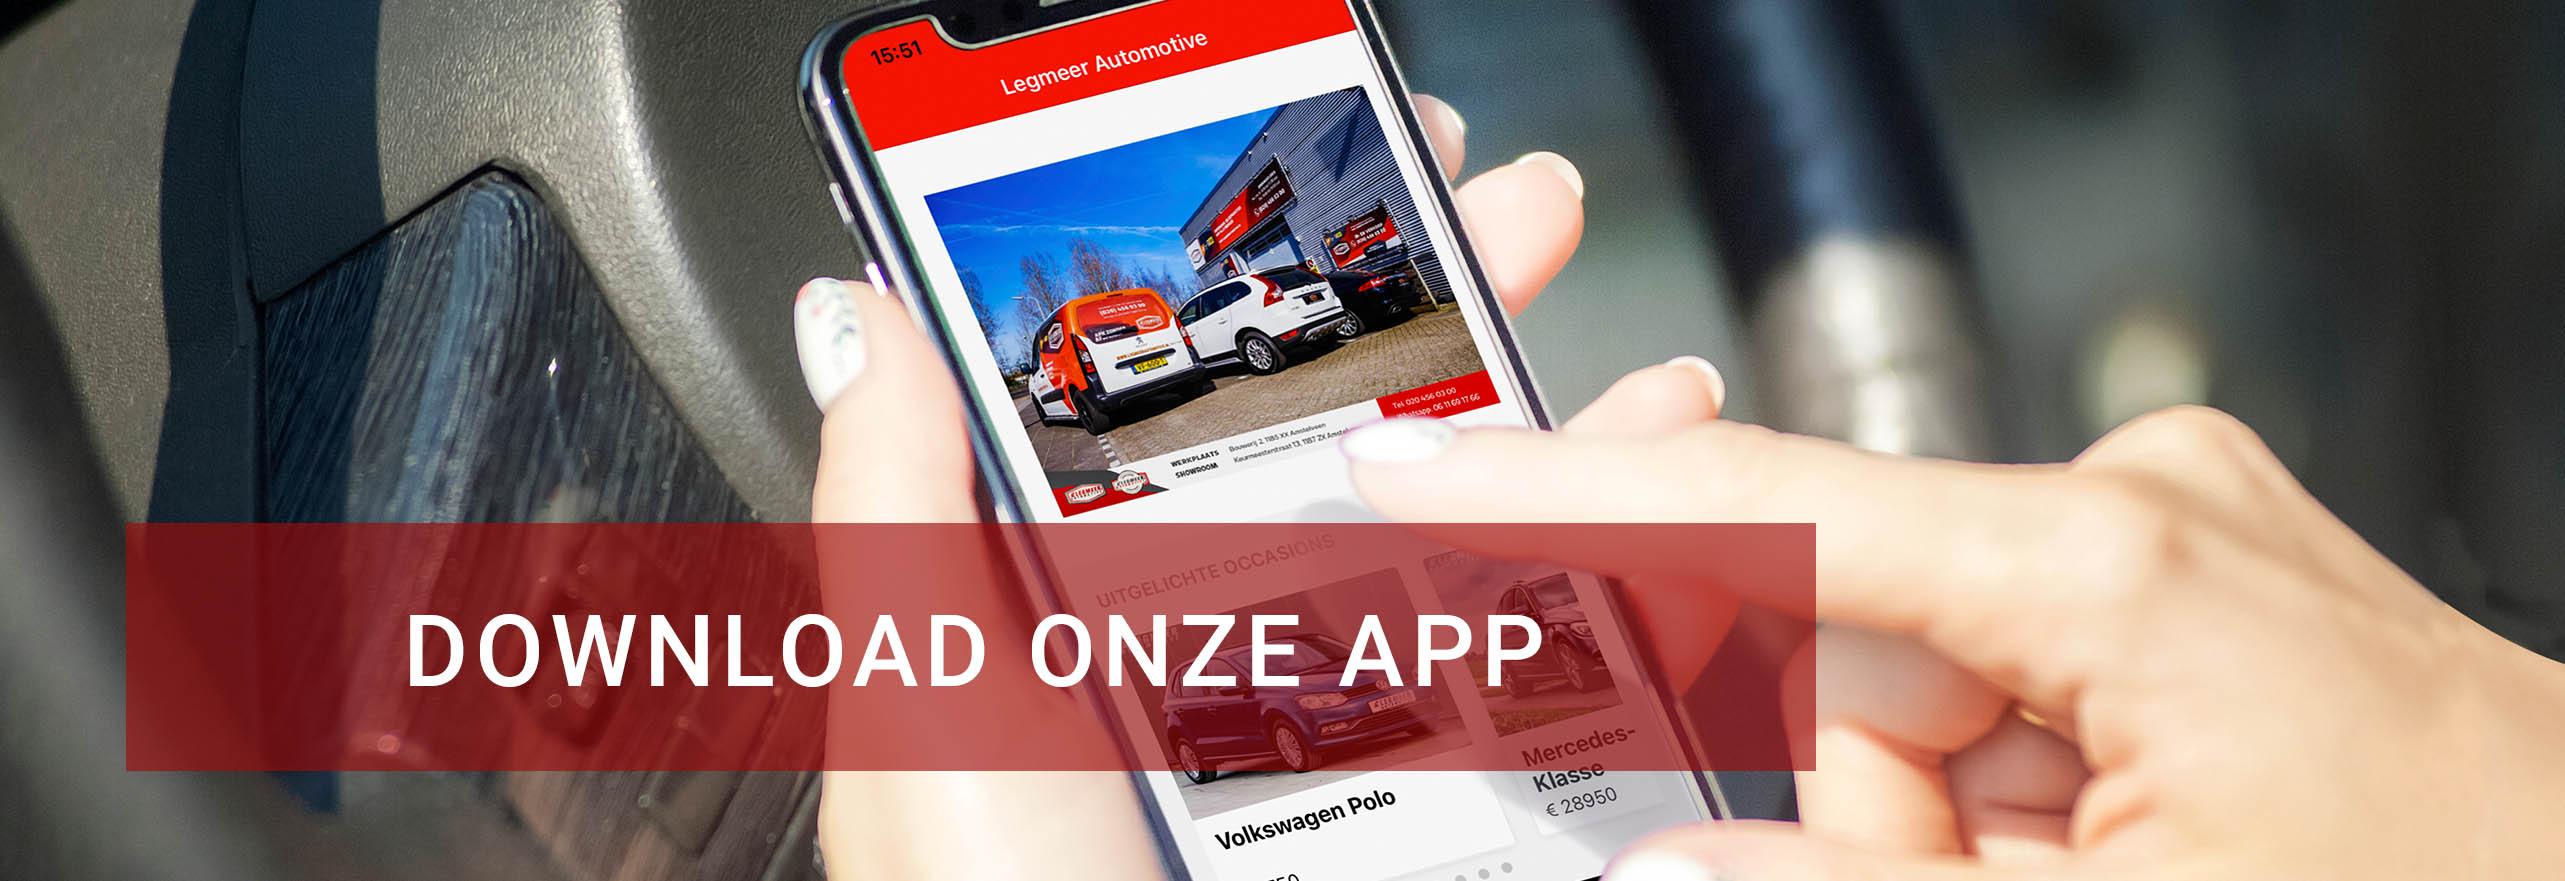 Legmeer Automotive app